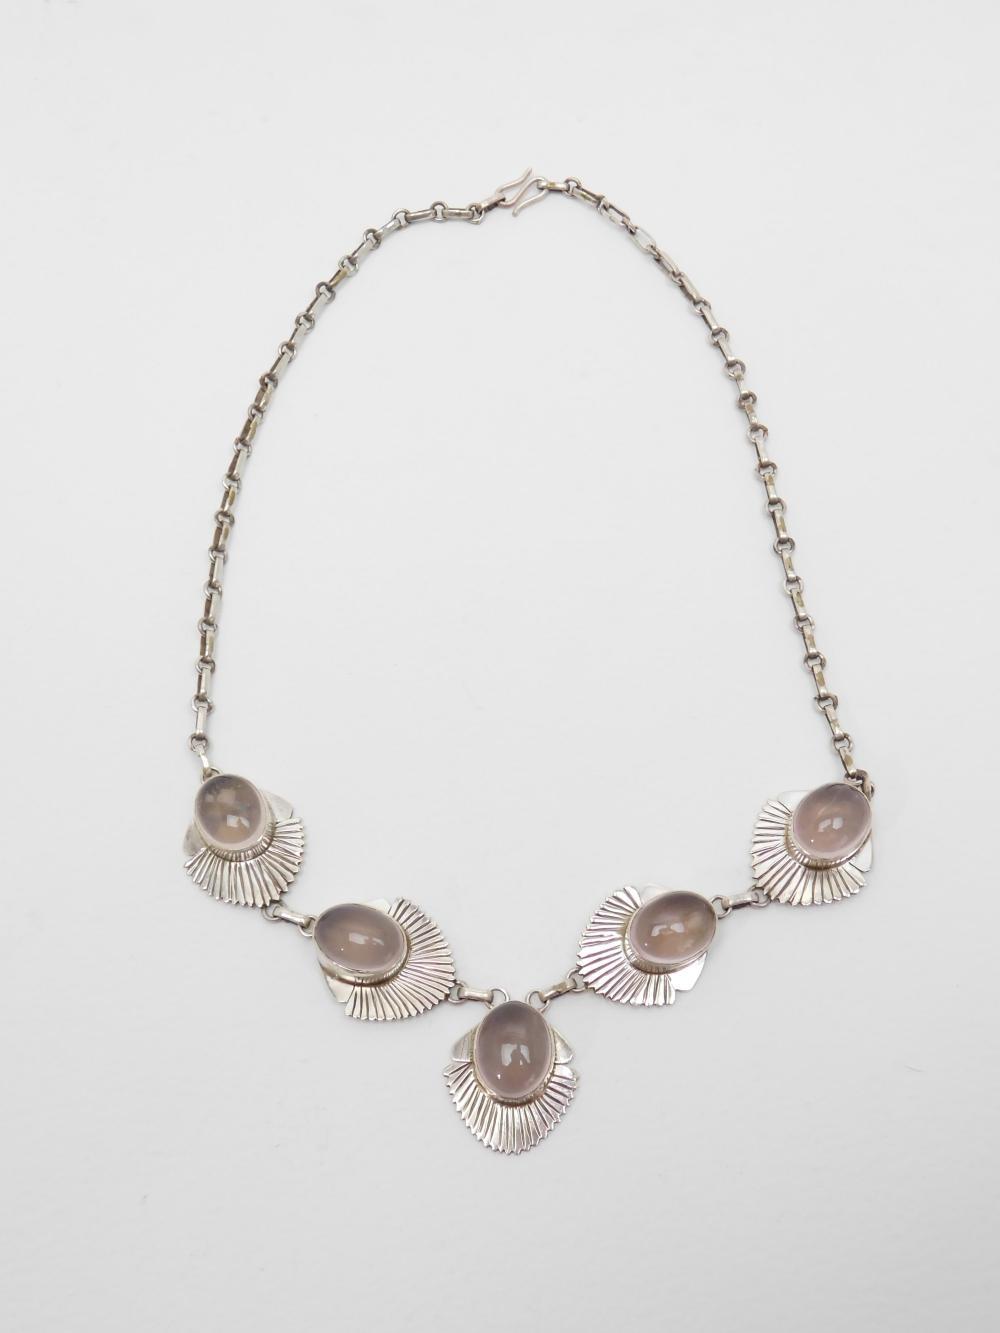 Southwestern Handmade Sterling Silver Rose Quartz 5 Stone Necklace 38G